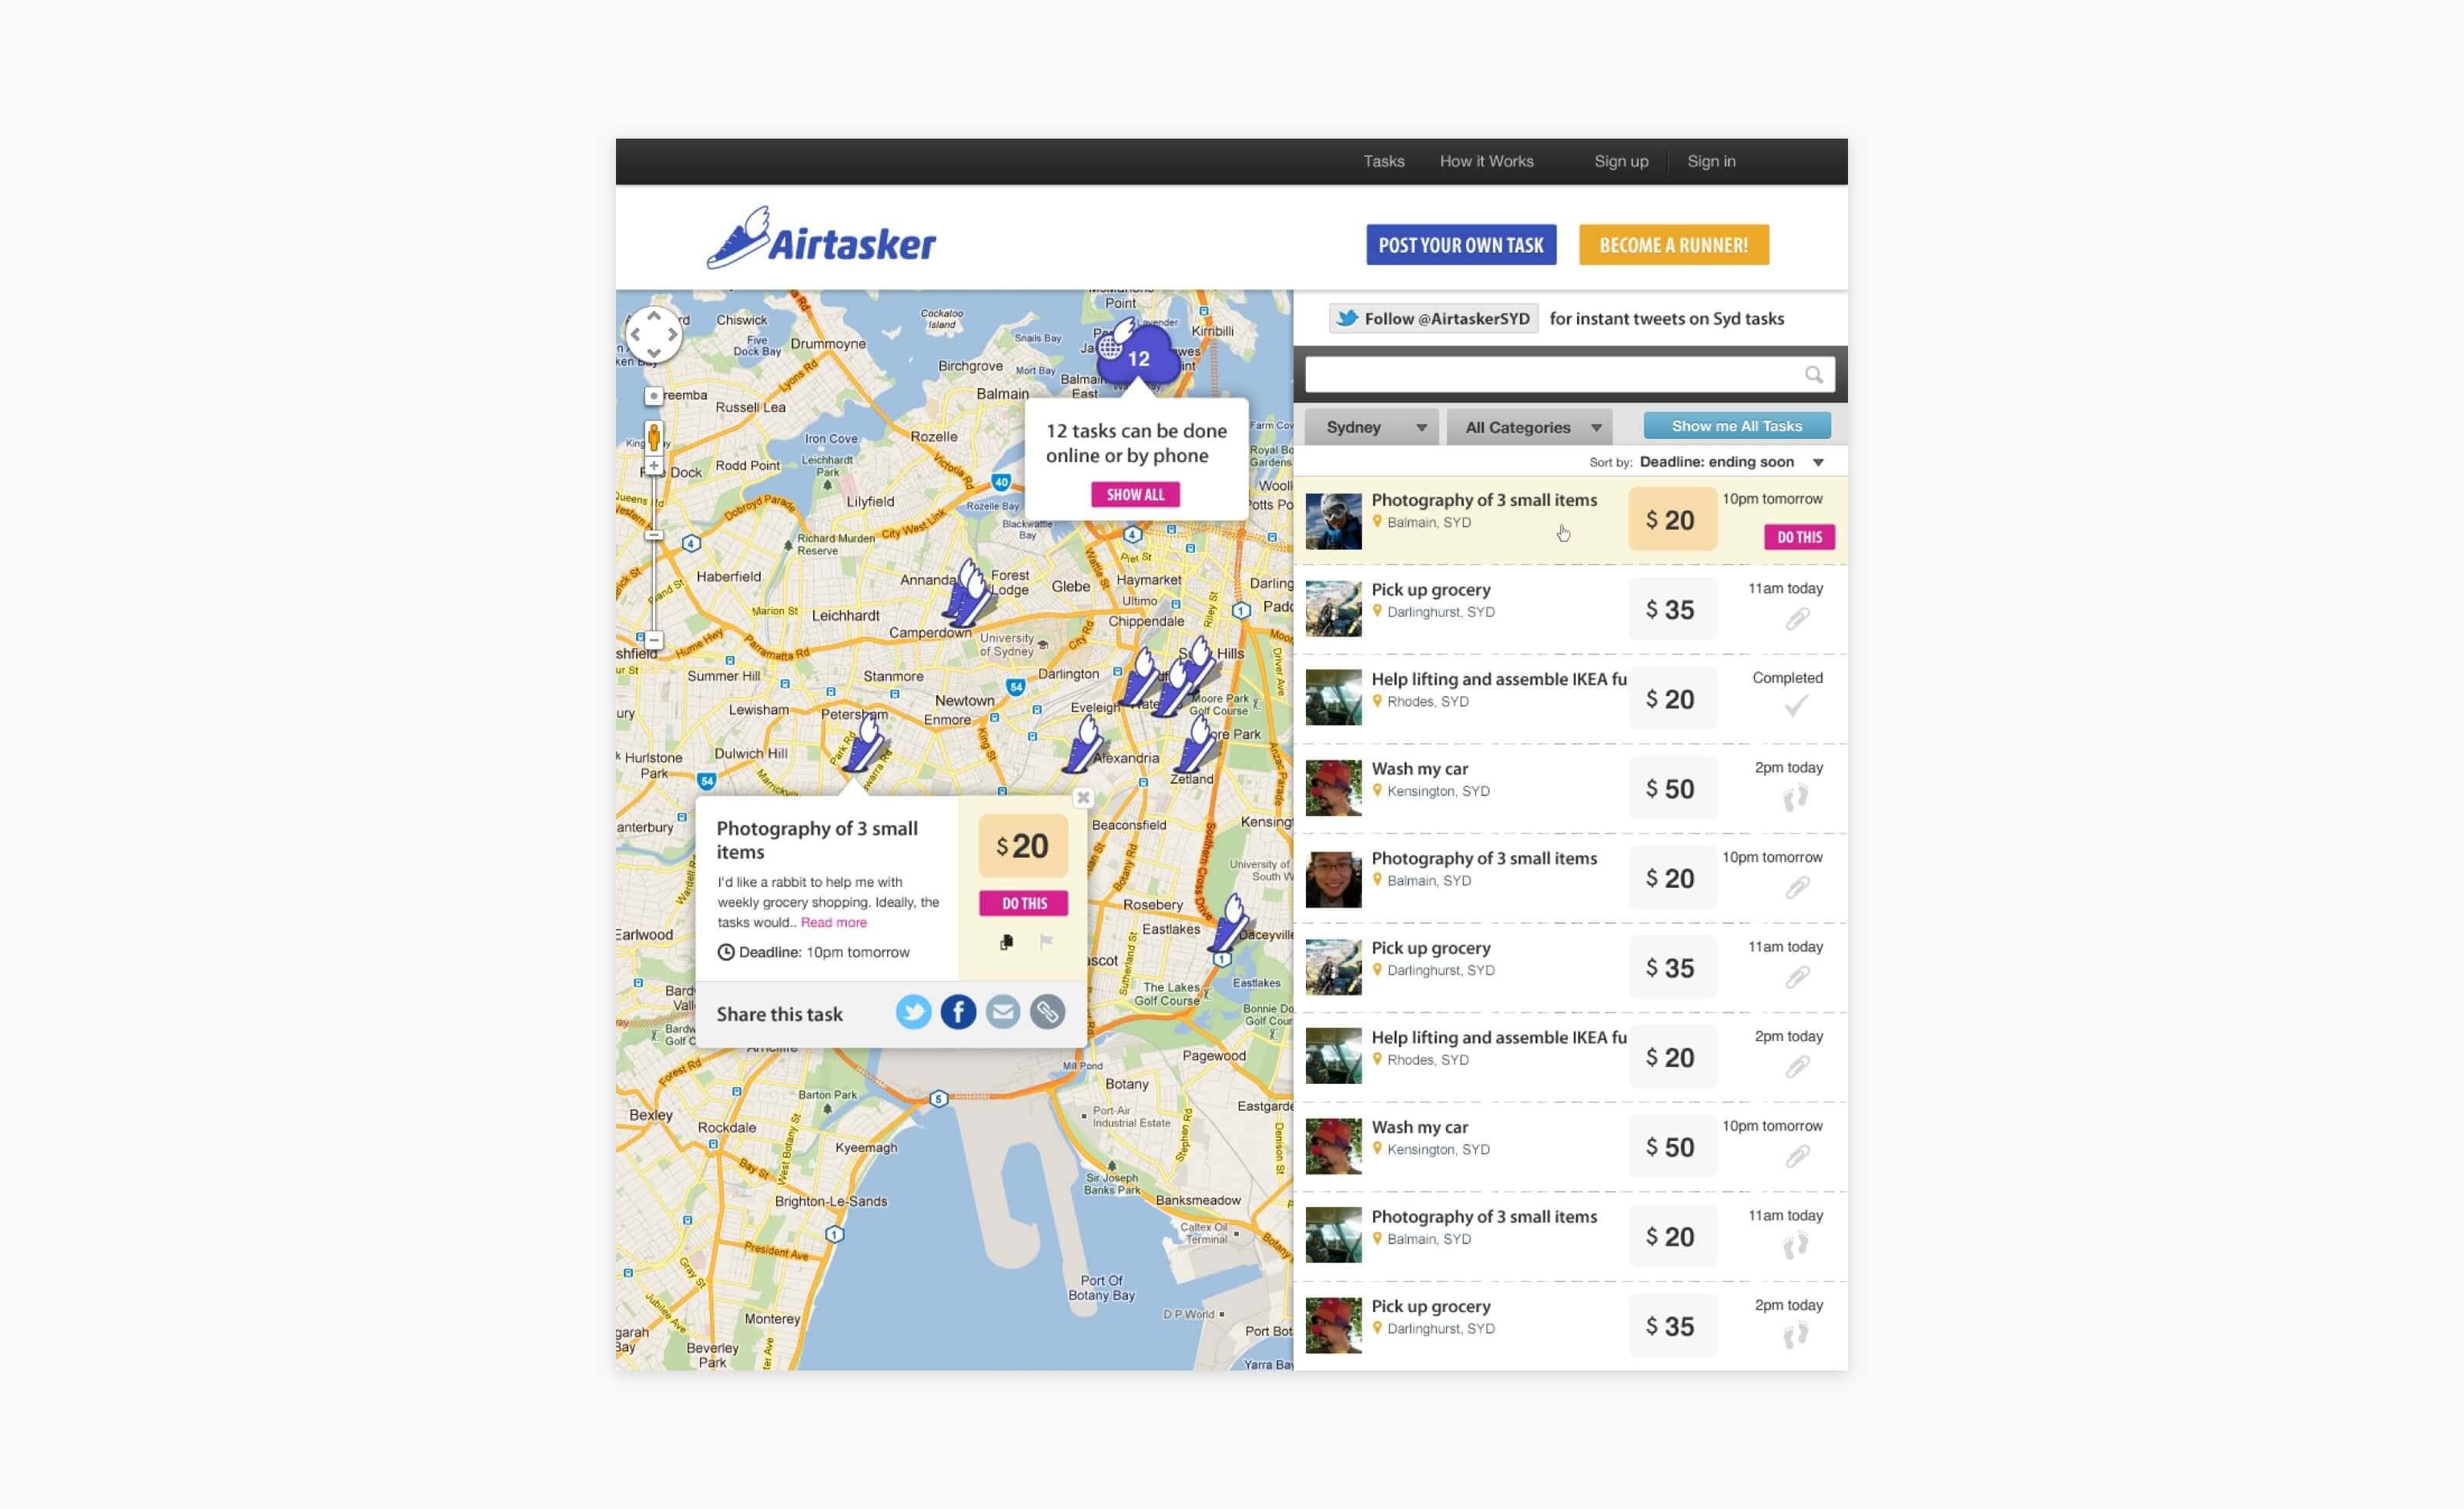 airtasker web browse tasks